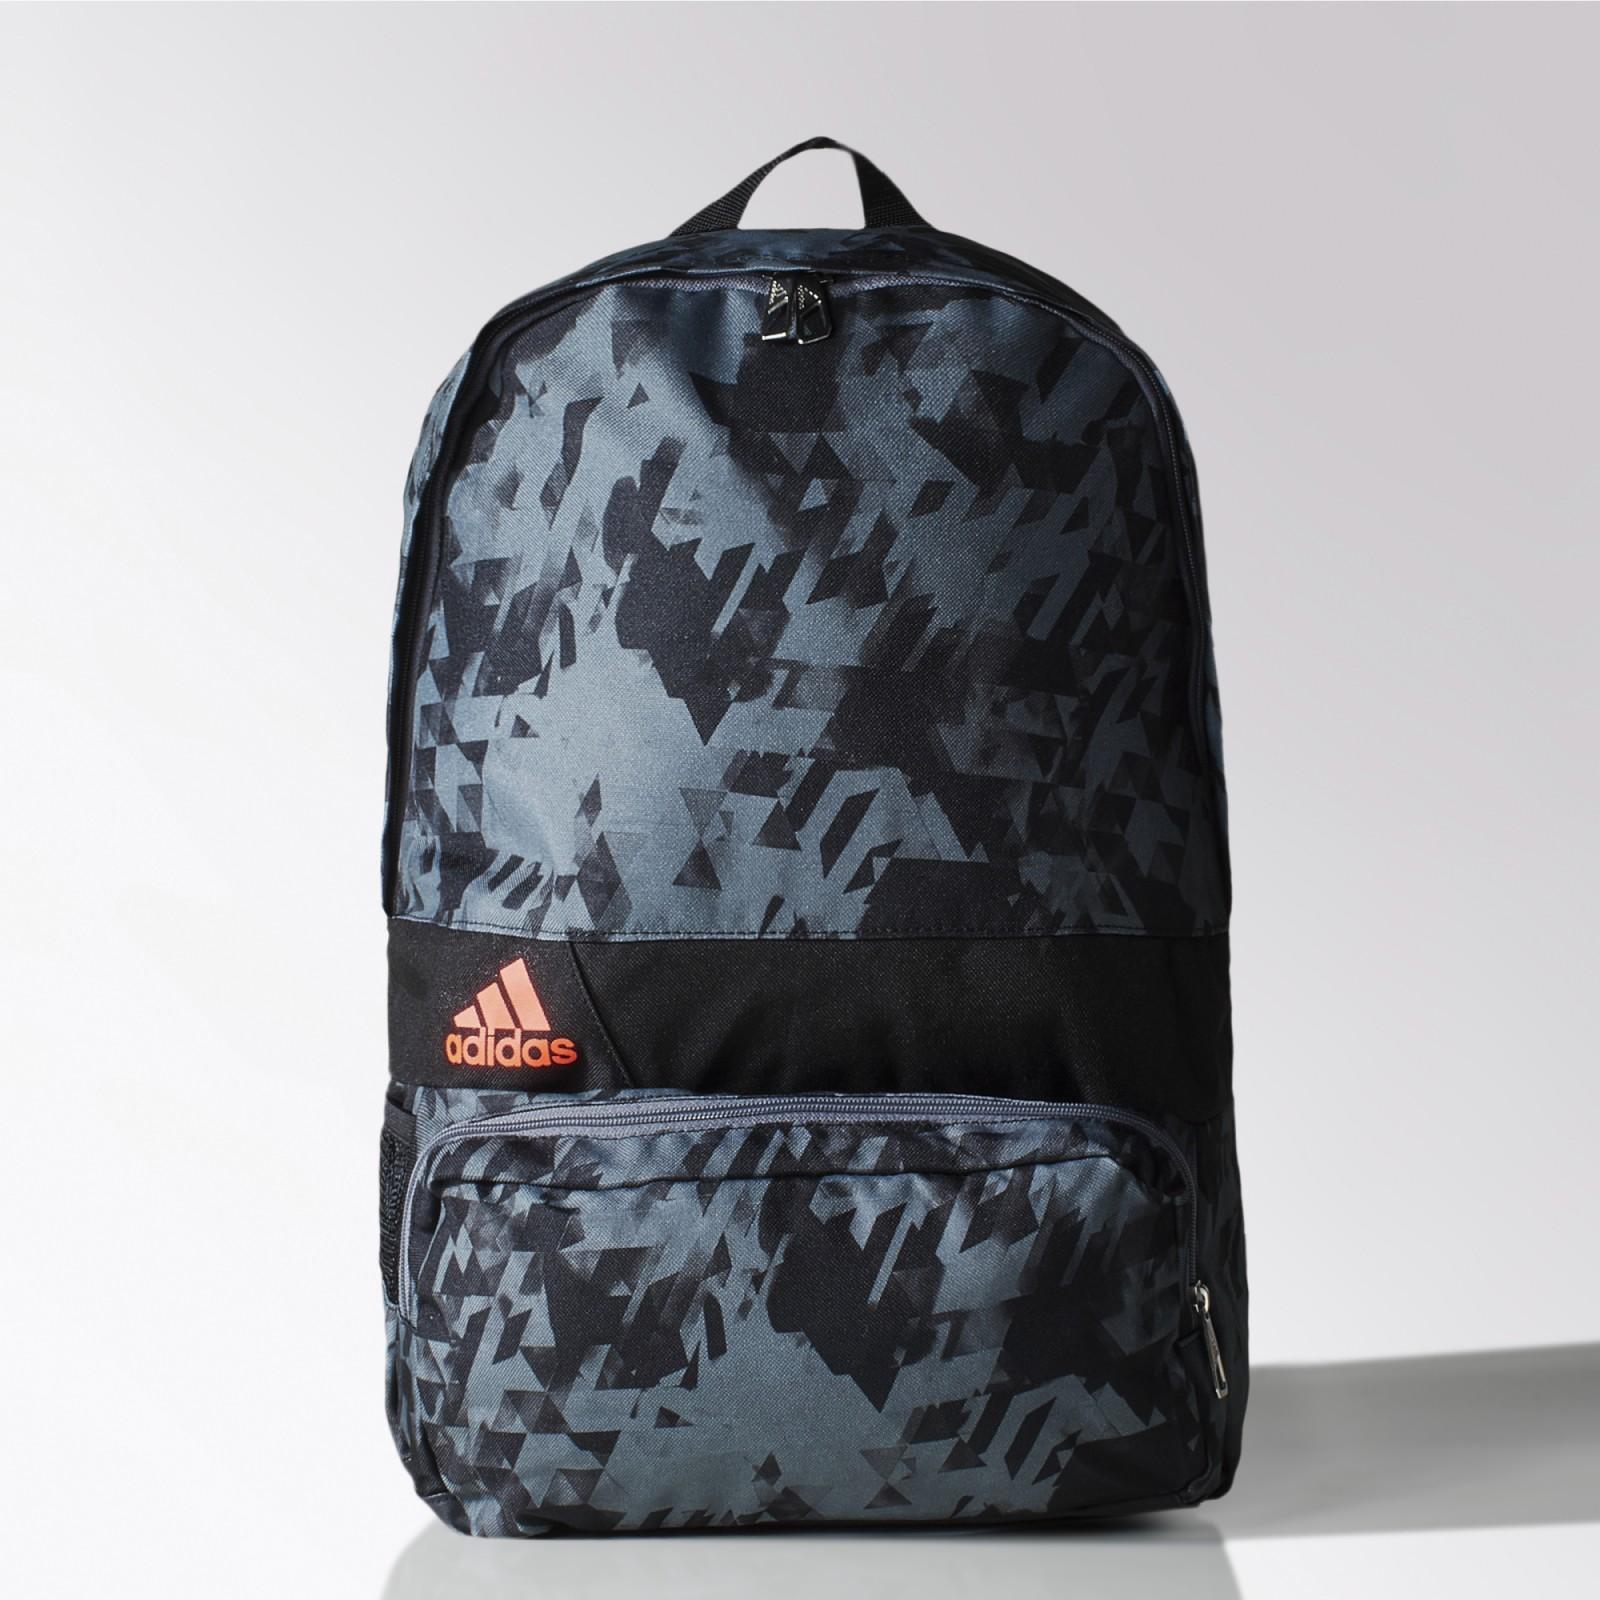 a5249442da9 Pánský batoh adidas DER BP M GRA 2